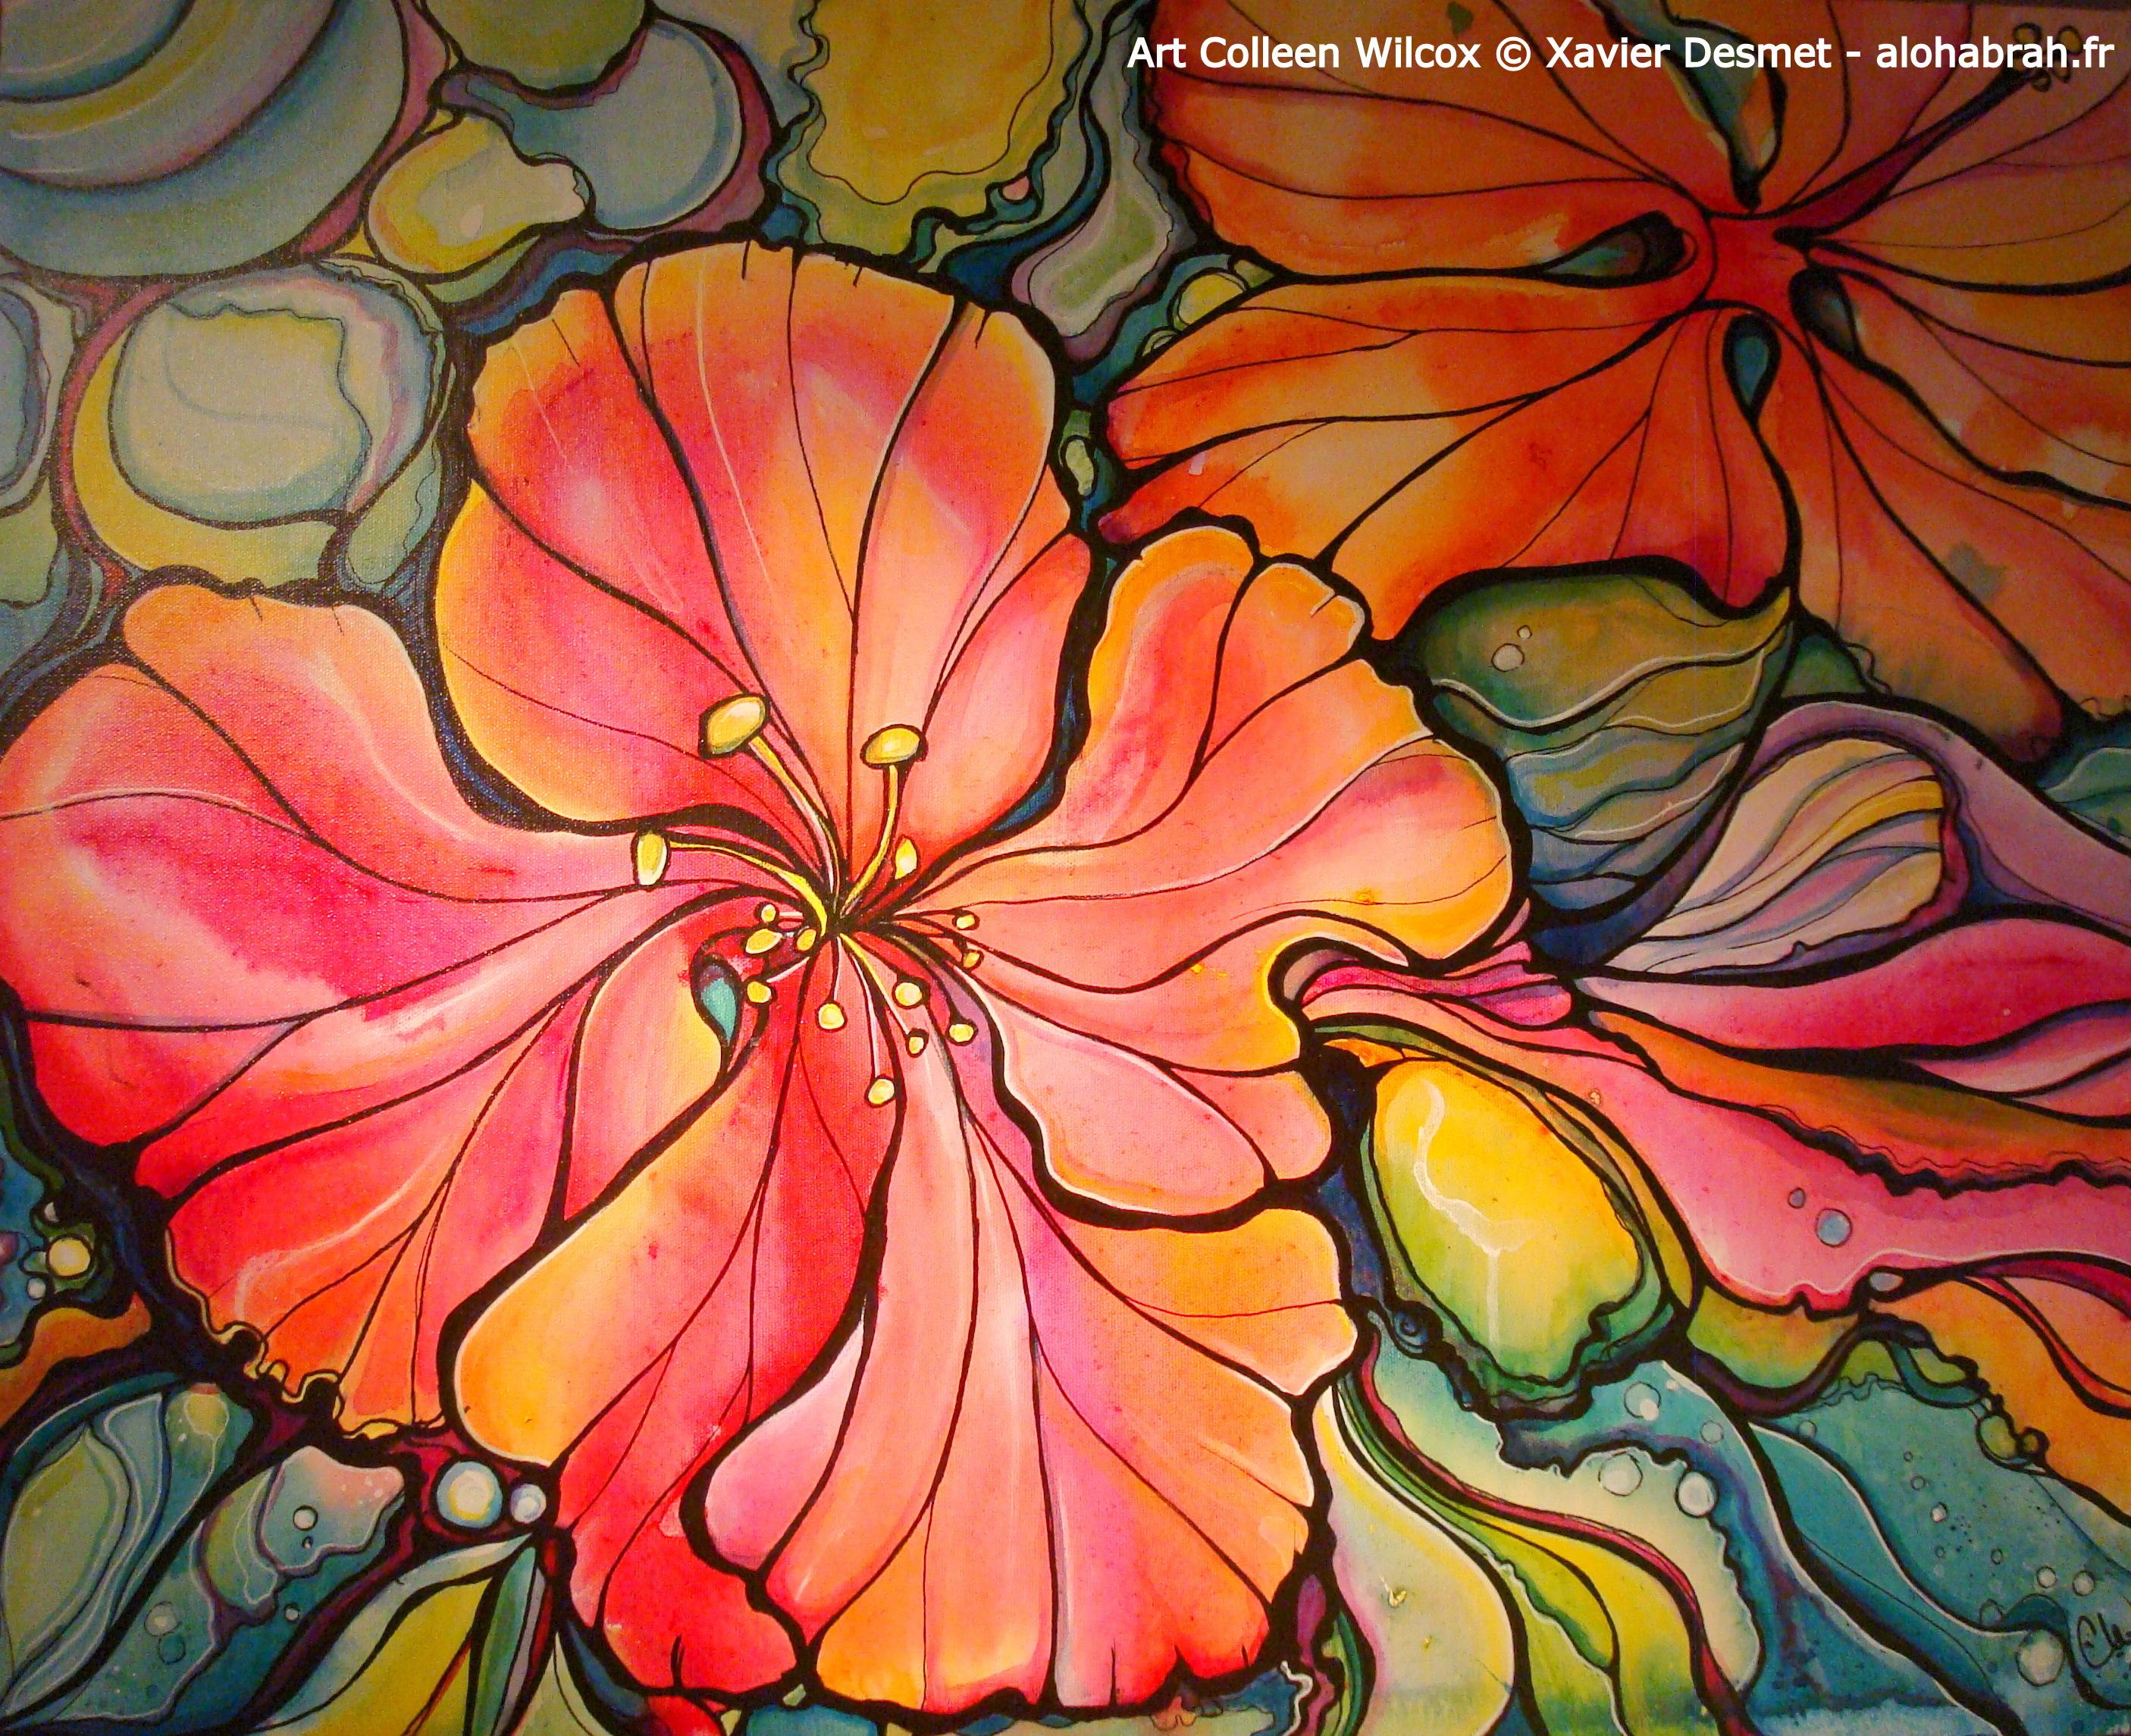 Hawaiian Flowers - Art Colleen Wilcox © Xavier Desmet - alohabrah.fr